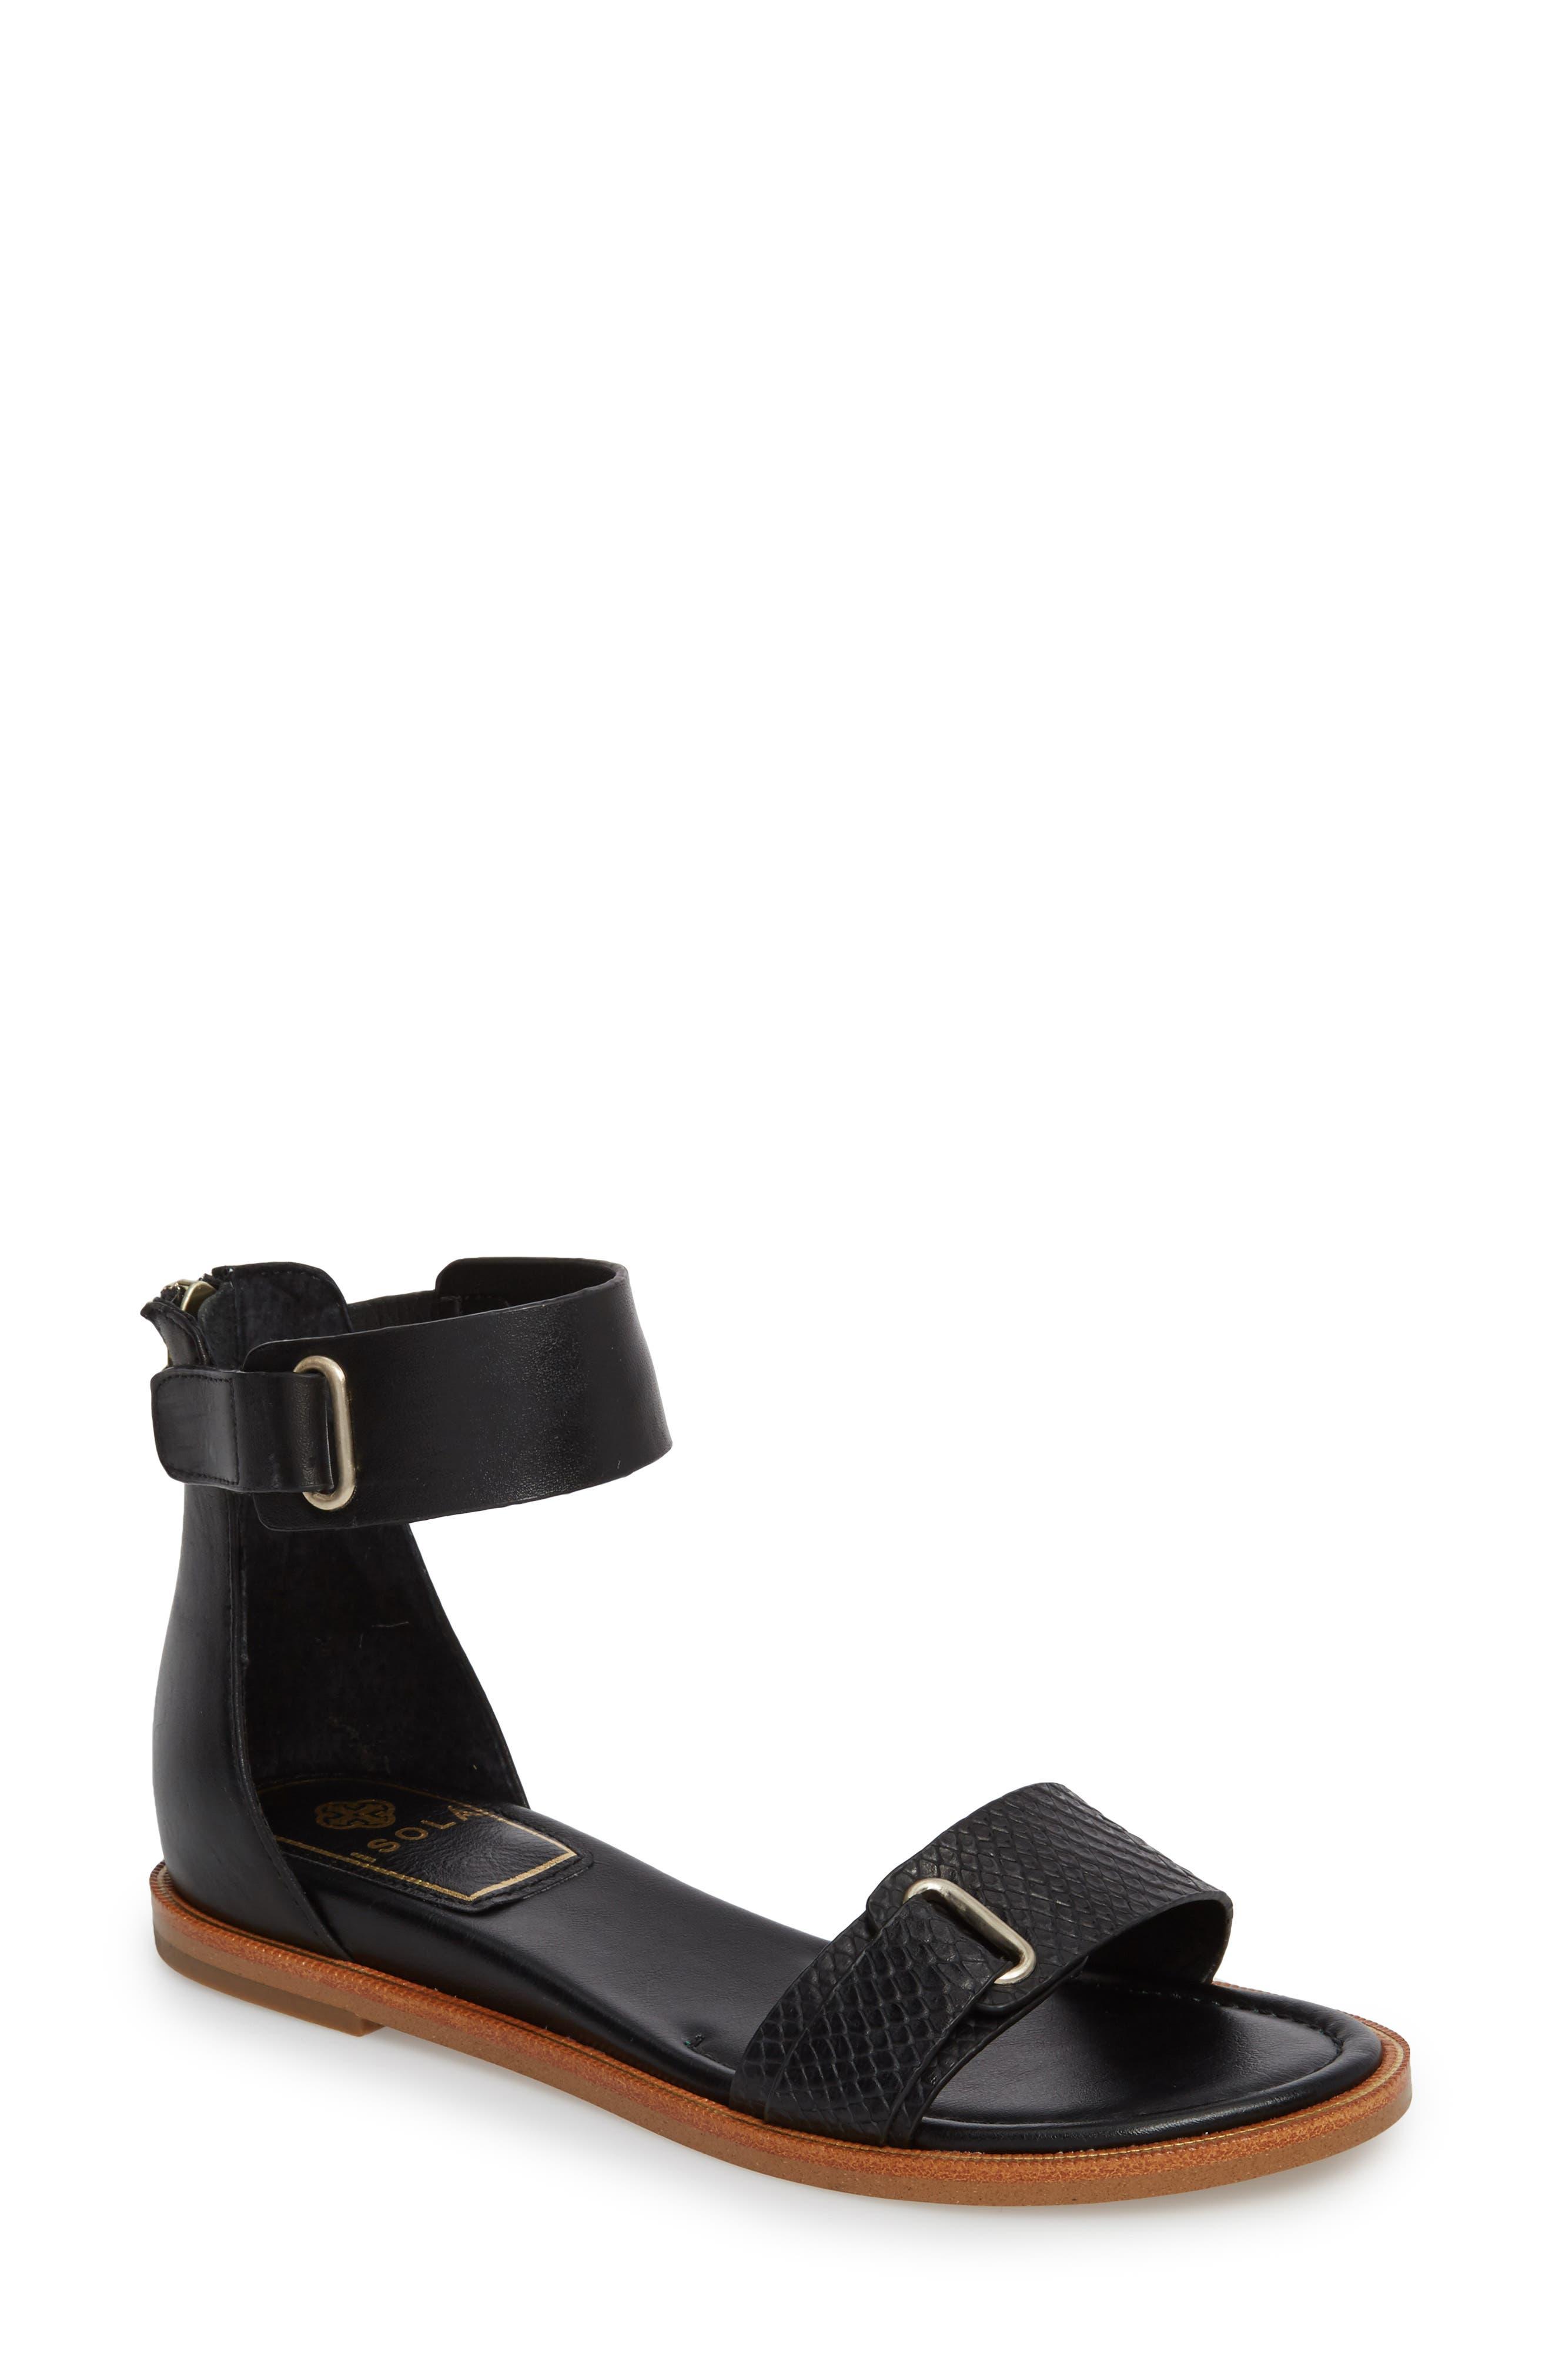 ISOLÁ Savina Ankle Strap Sandal, Main, color, BLACK LEATHER